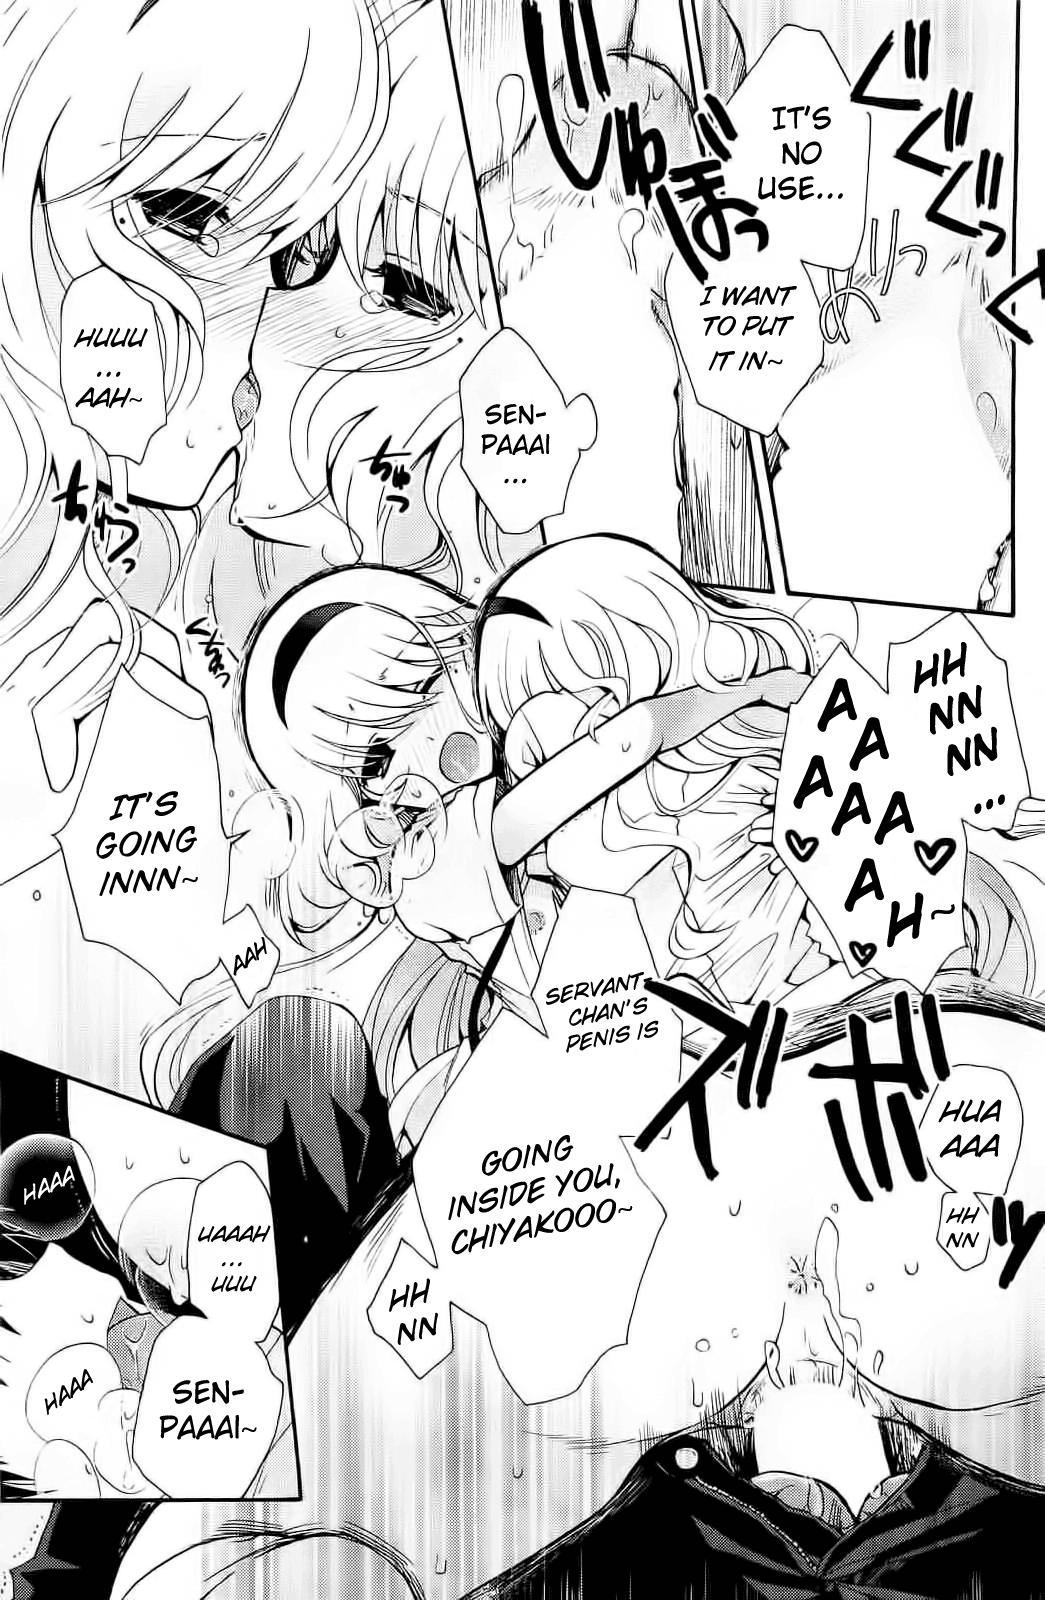 [Izumiya Otoha] Geboku-chan Sharing | Servant-chan Sharing (Comic Hotmilk 2013-09) [English] {The Lusty Lady Project} 14